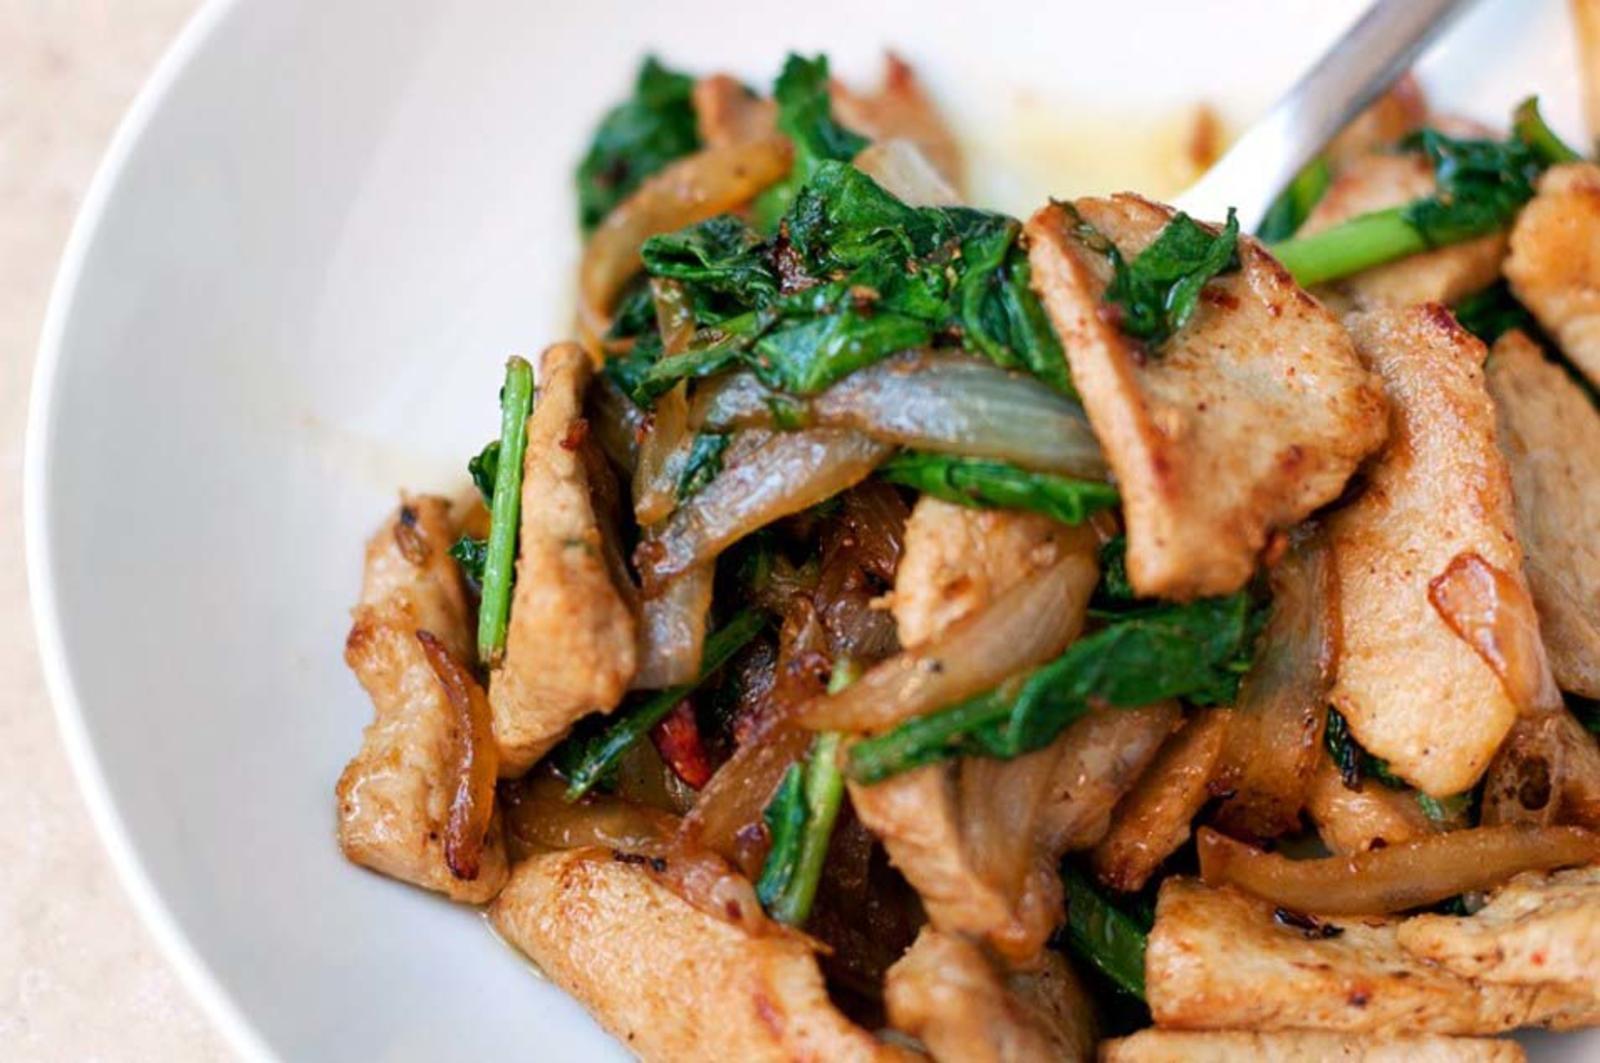 блюда из жареной свинины рецепты с фото интерьере